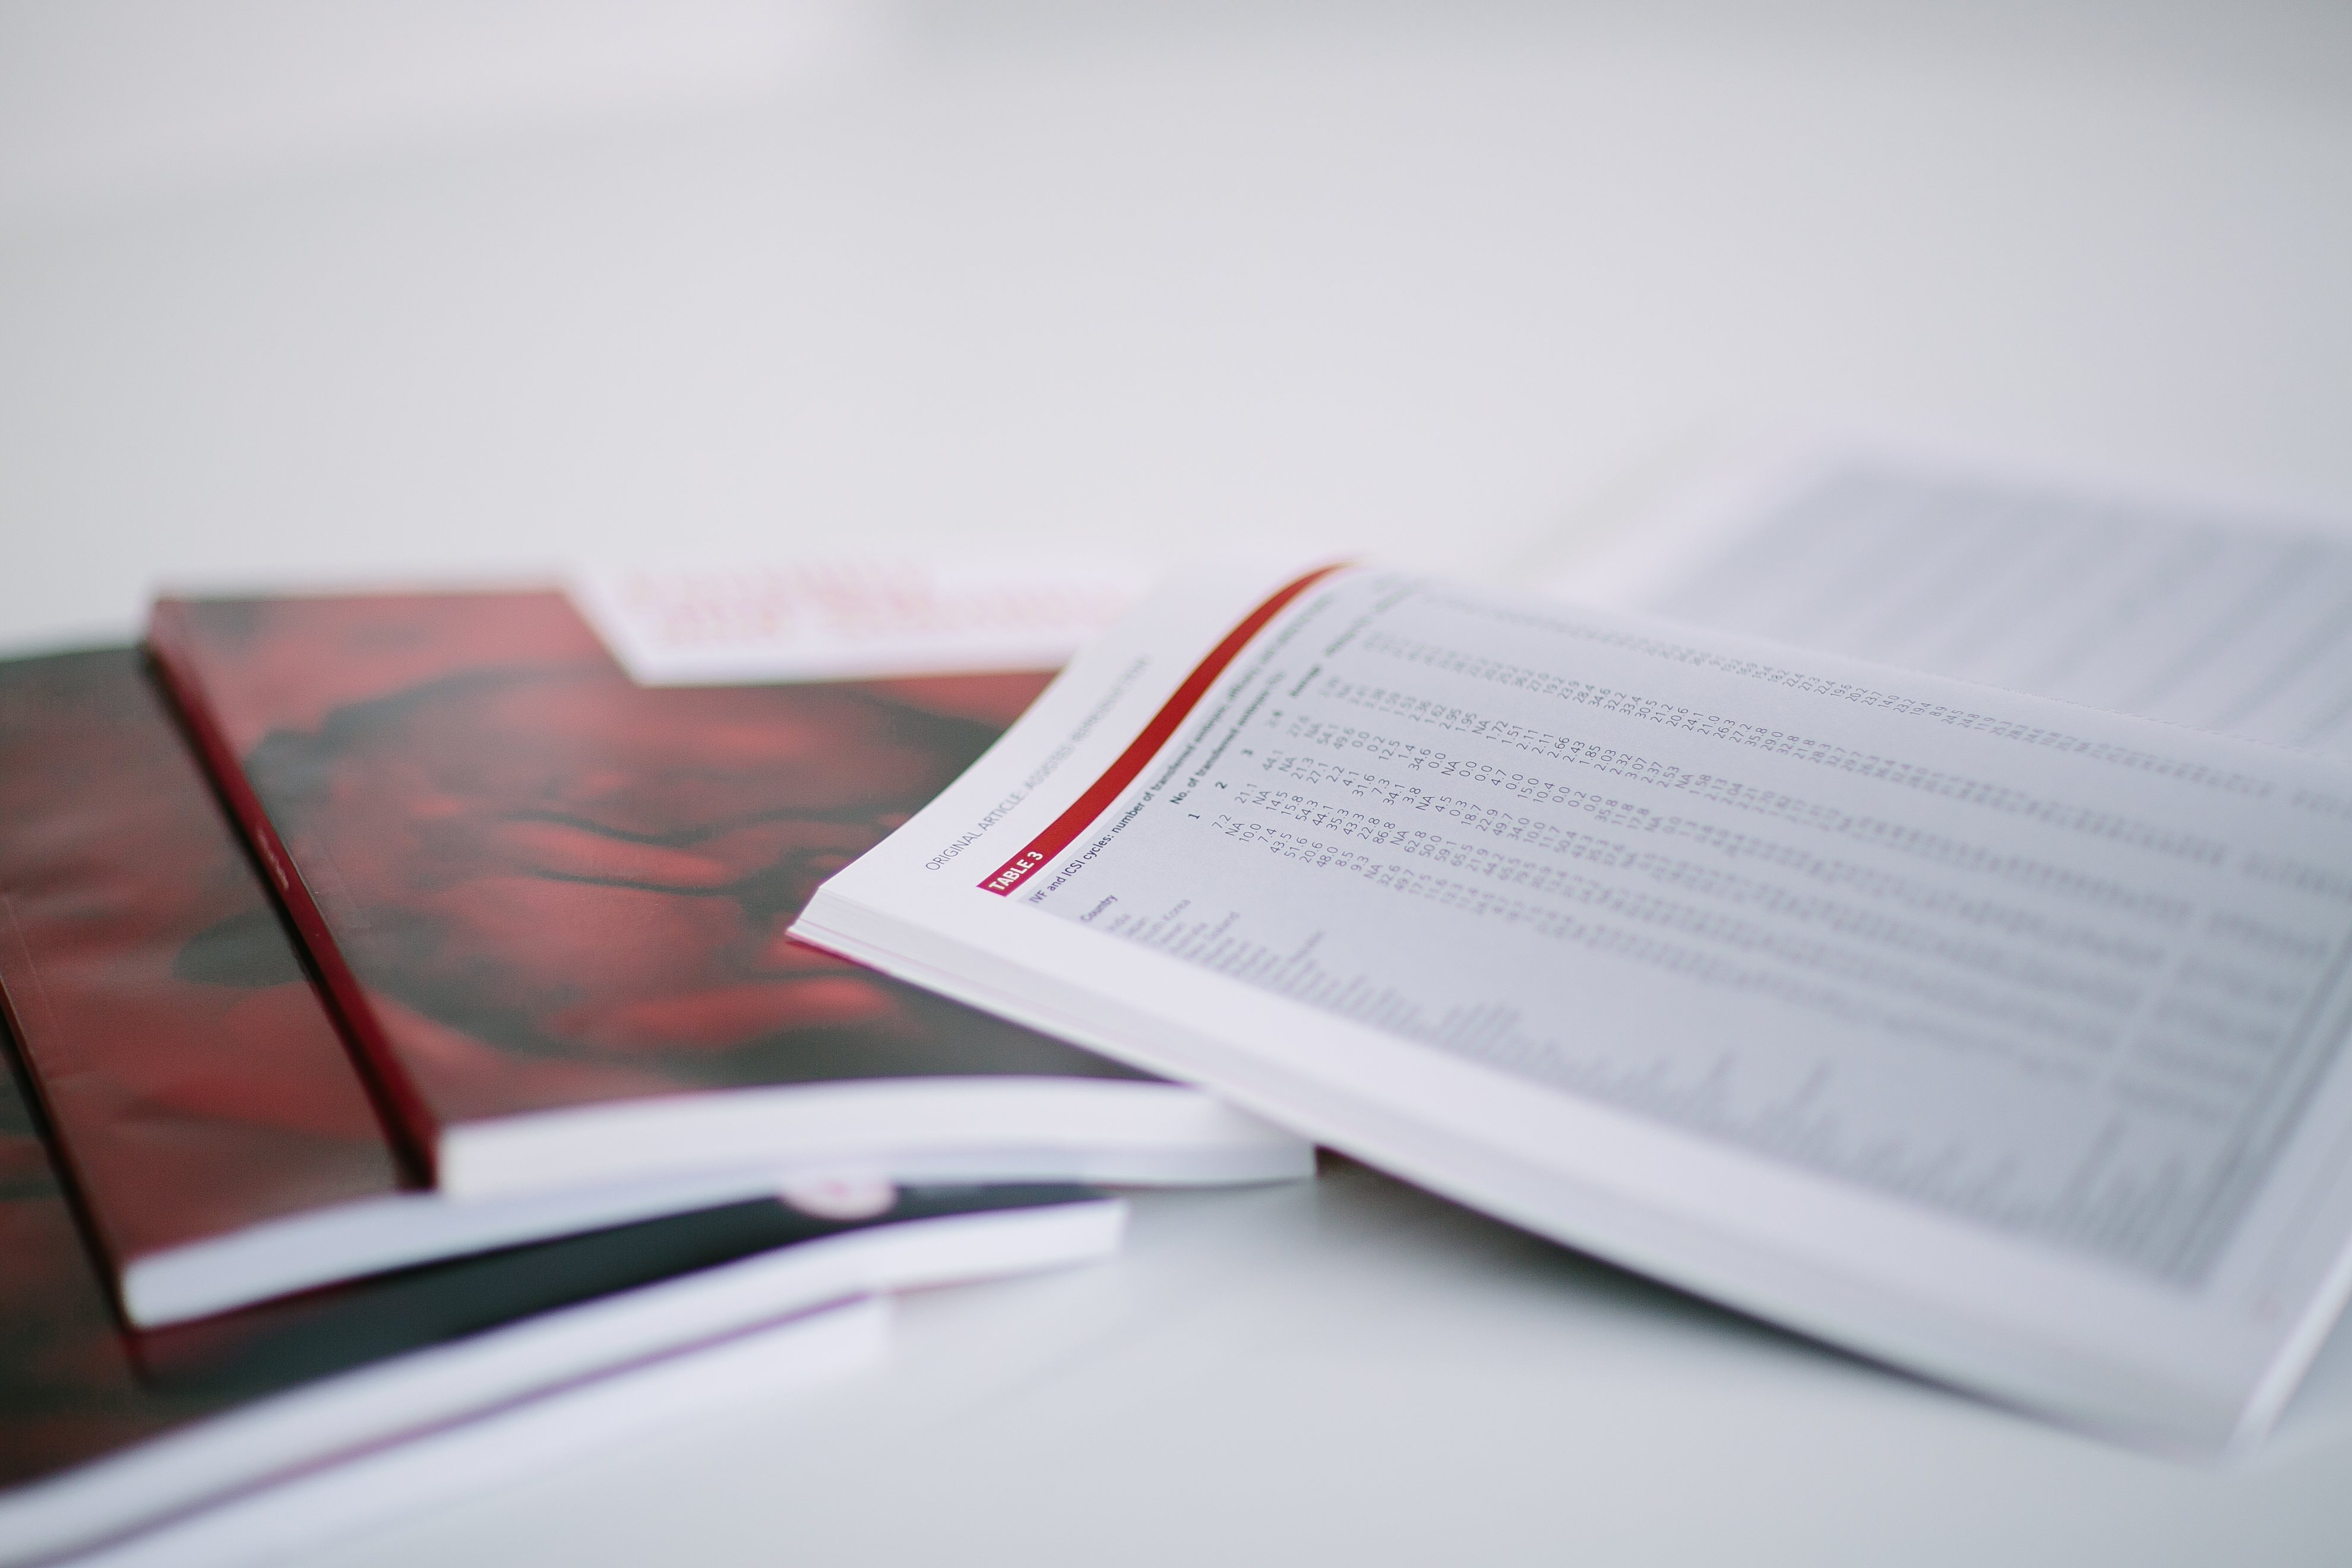 Books on IVF procedures and ICSI treatments